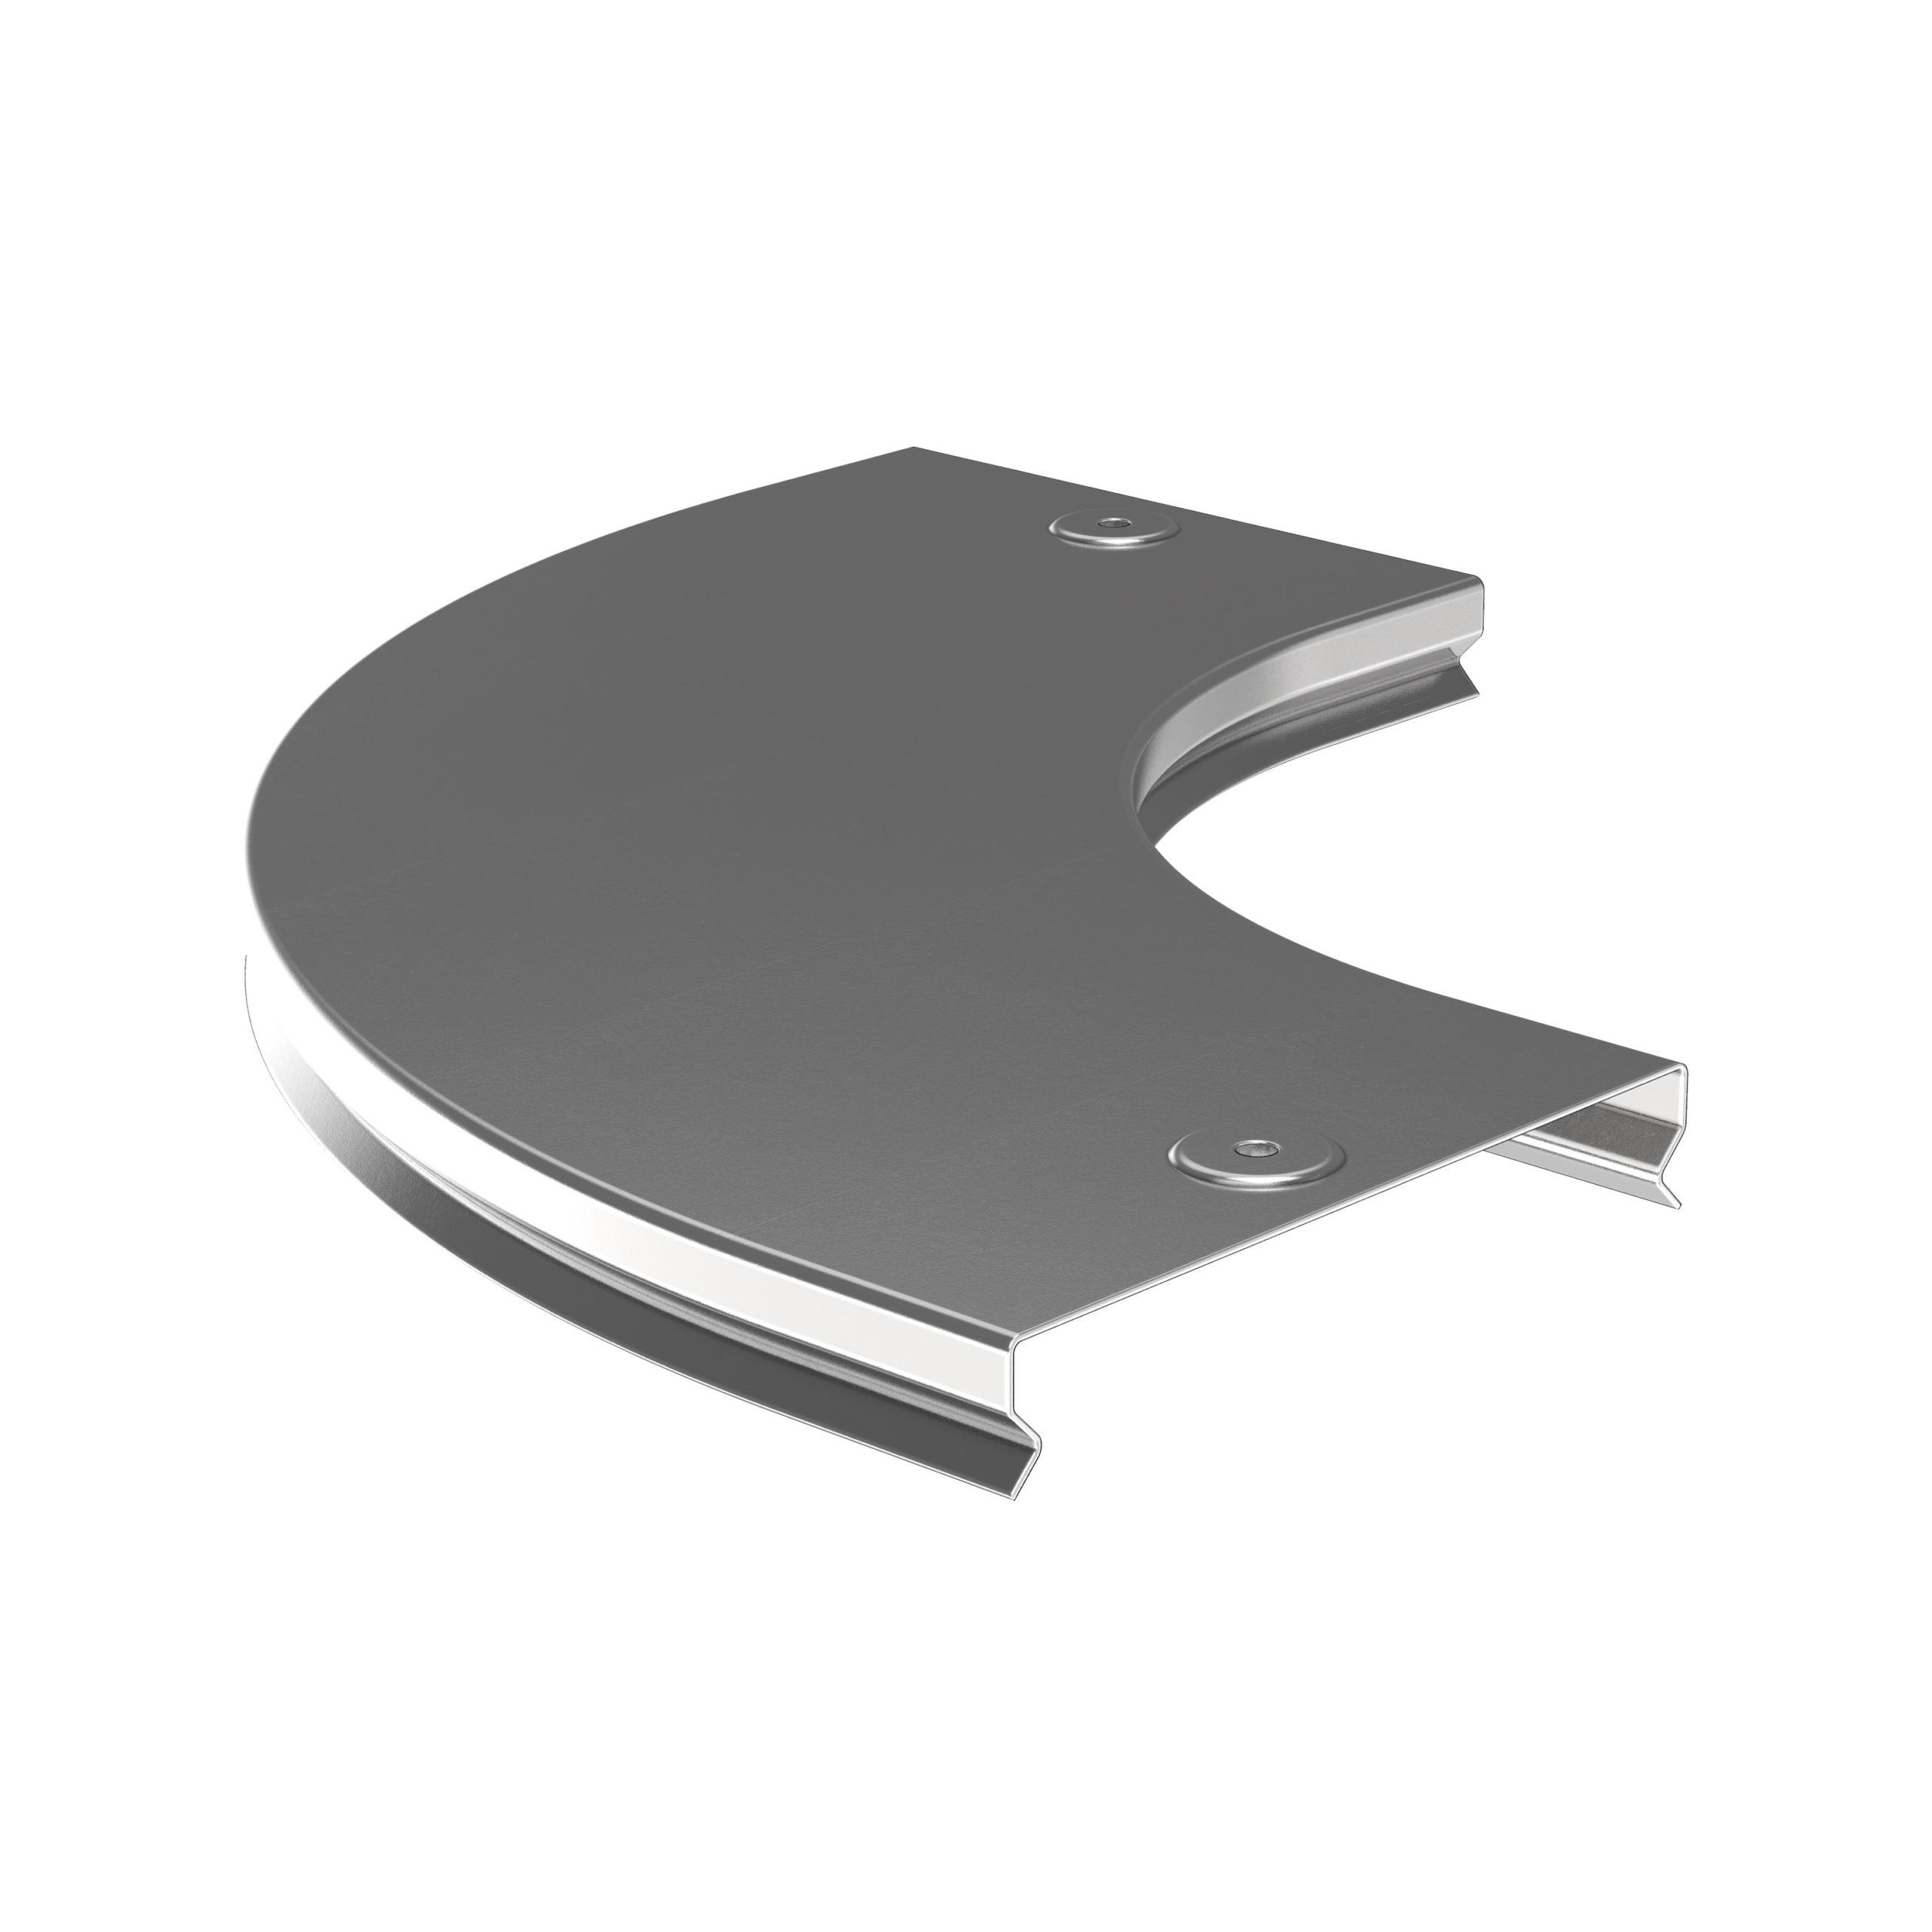 Крышка поворота плавного 90град (тип Г01) ESCA 600мм IEK 1